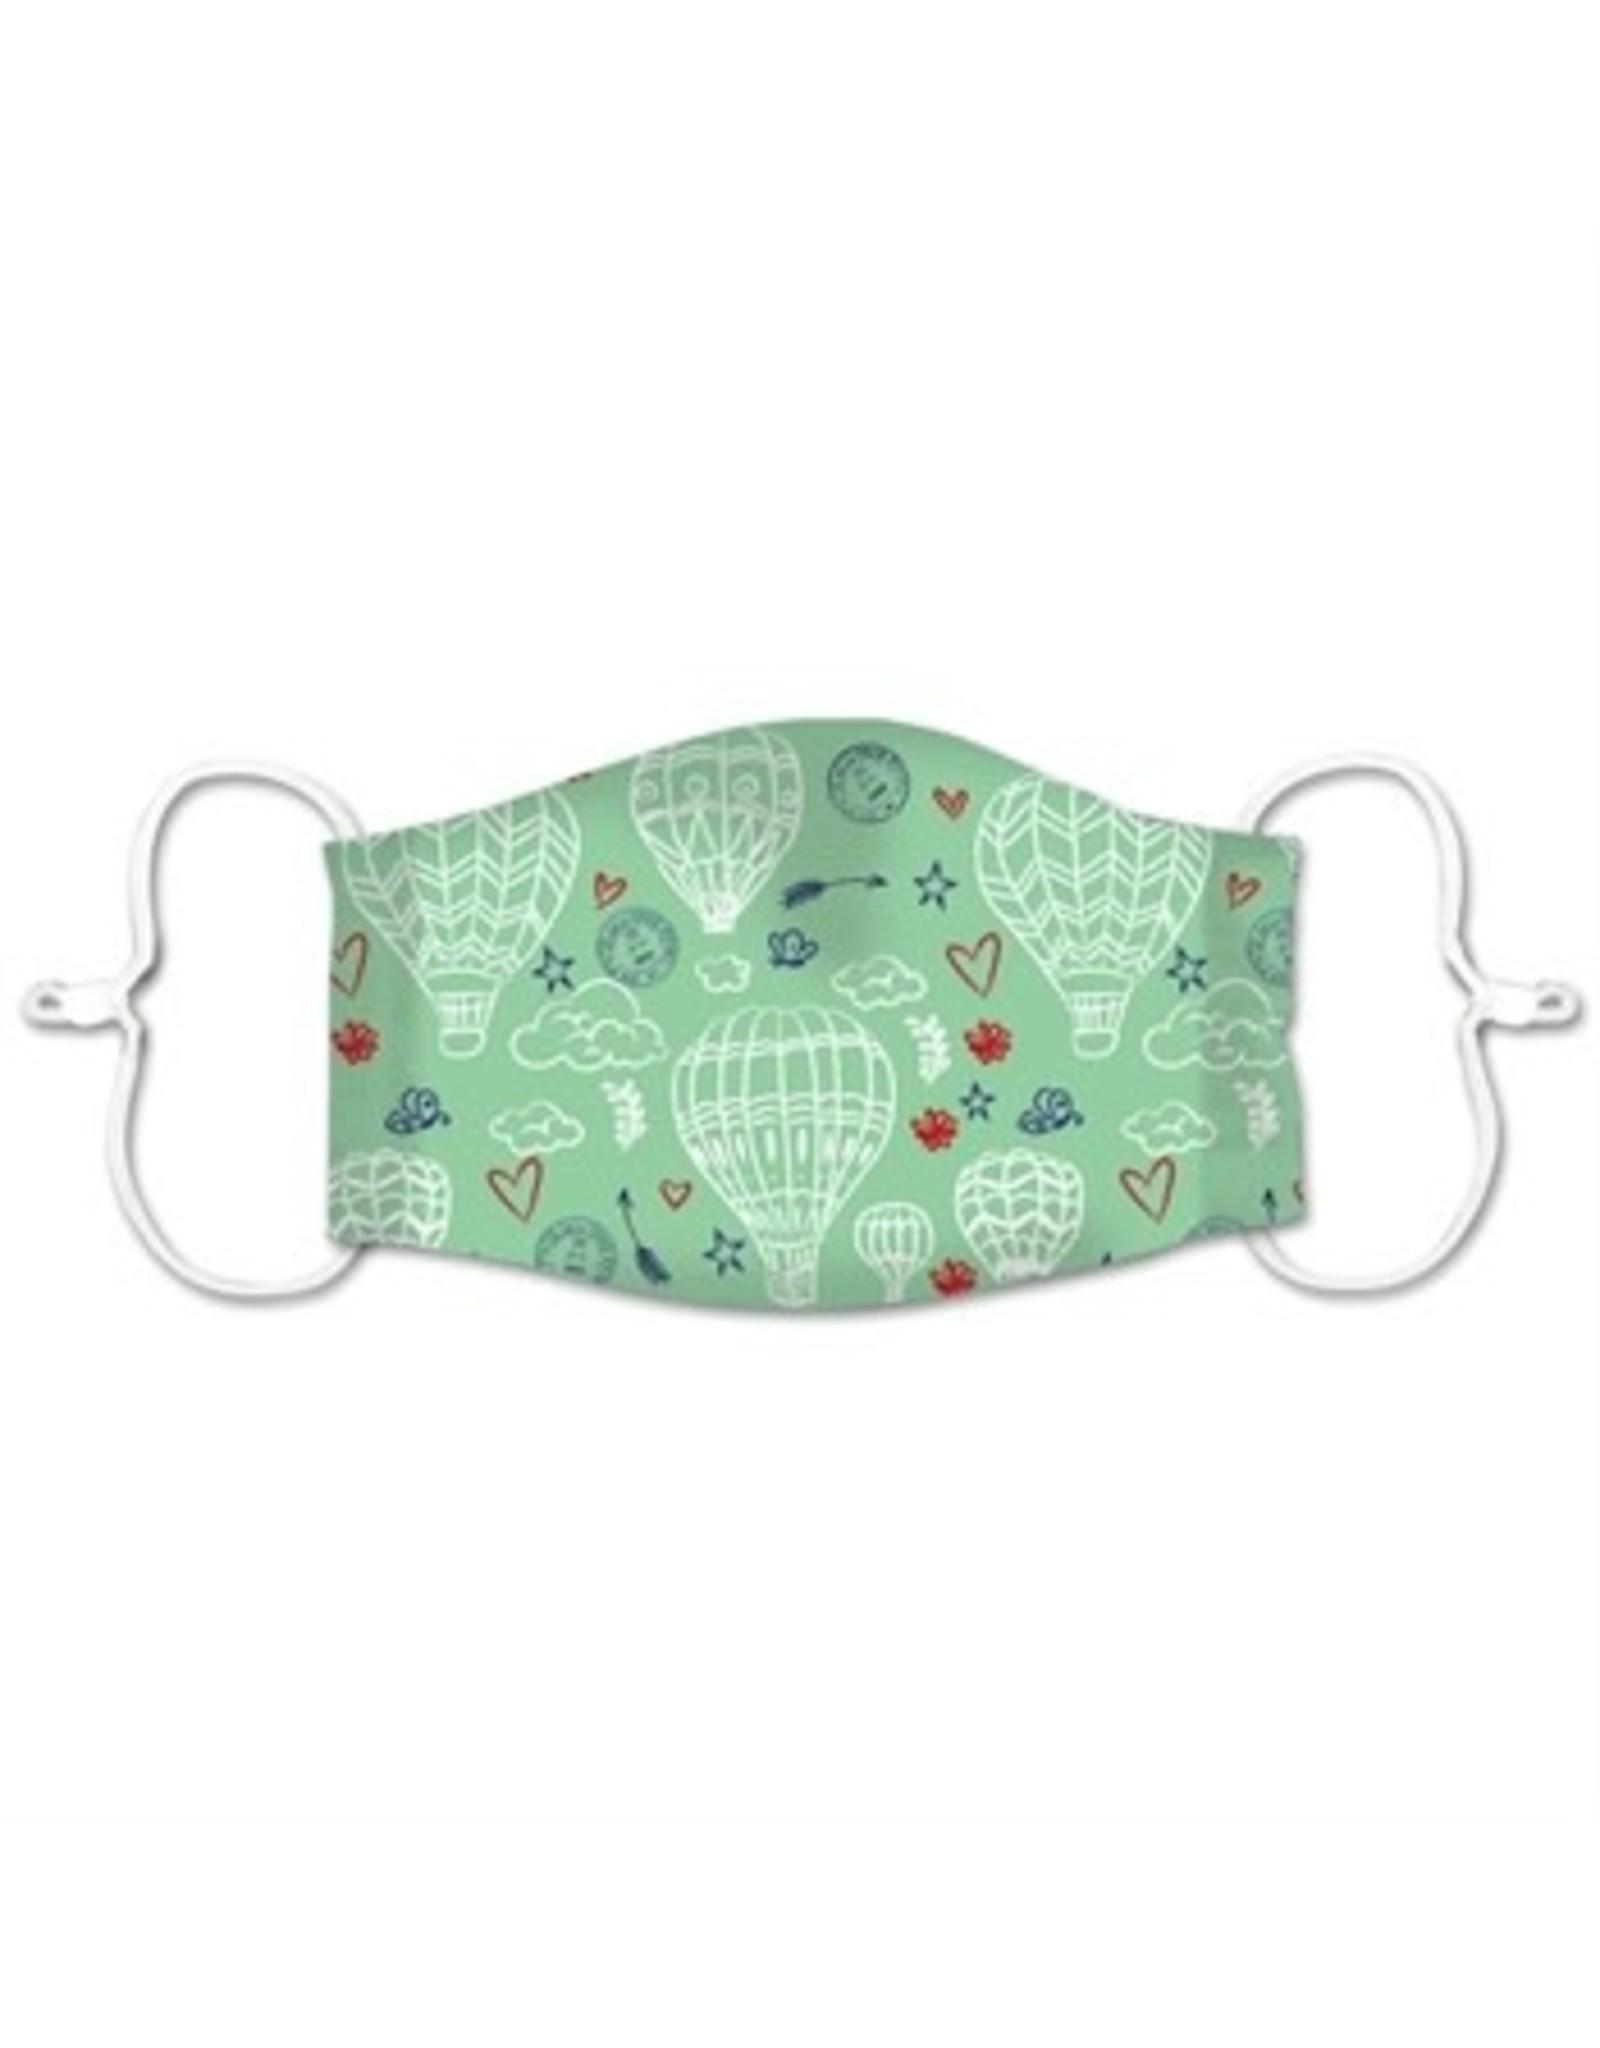 Evergreen Enterprises Children's Non-Medical Cotton Face Mask, 4 Designs